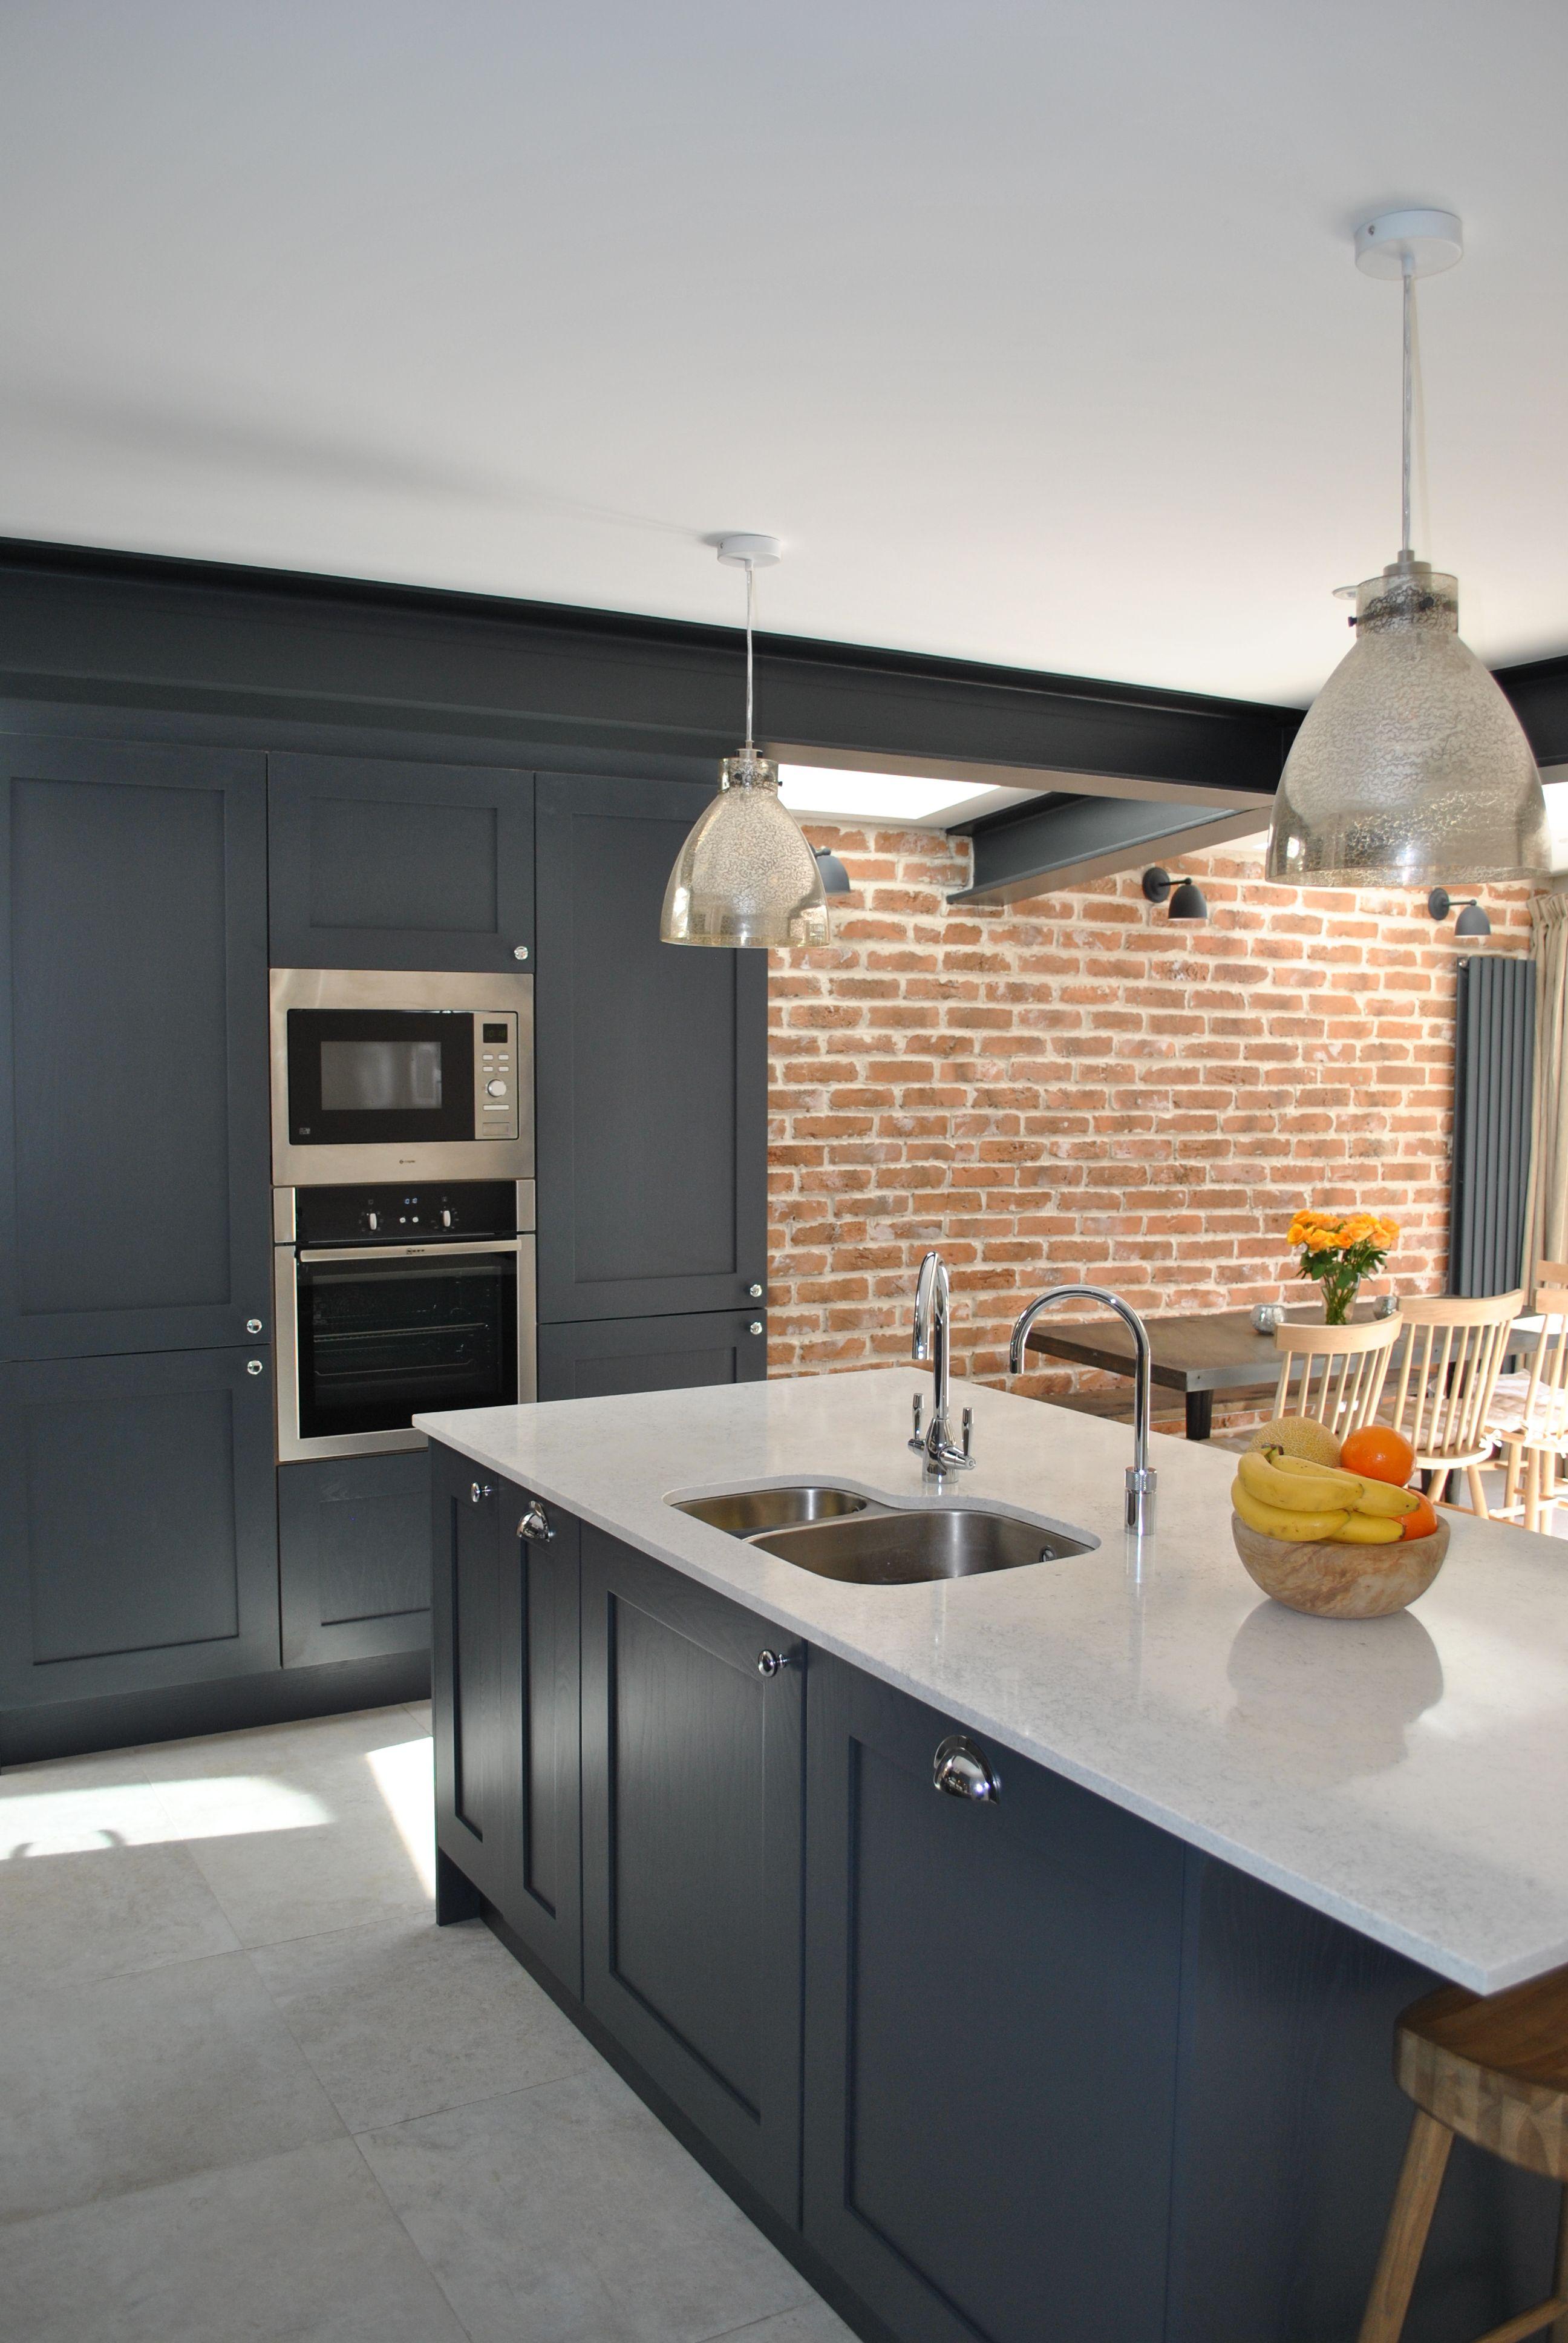 Best Modern Shaker Kitchen In Dark Slate Blue Looks Stunning 400 x 300